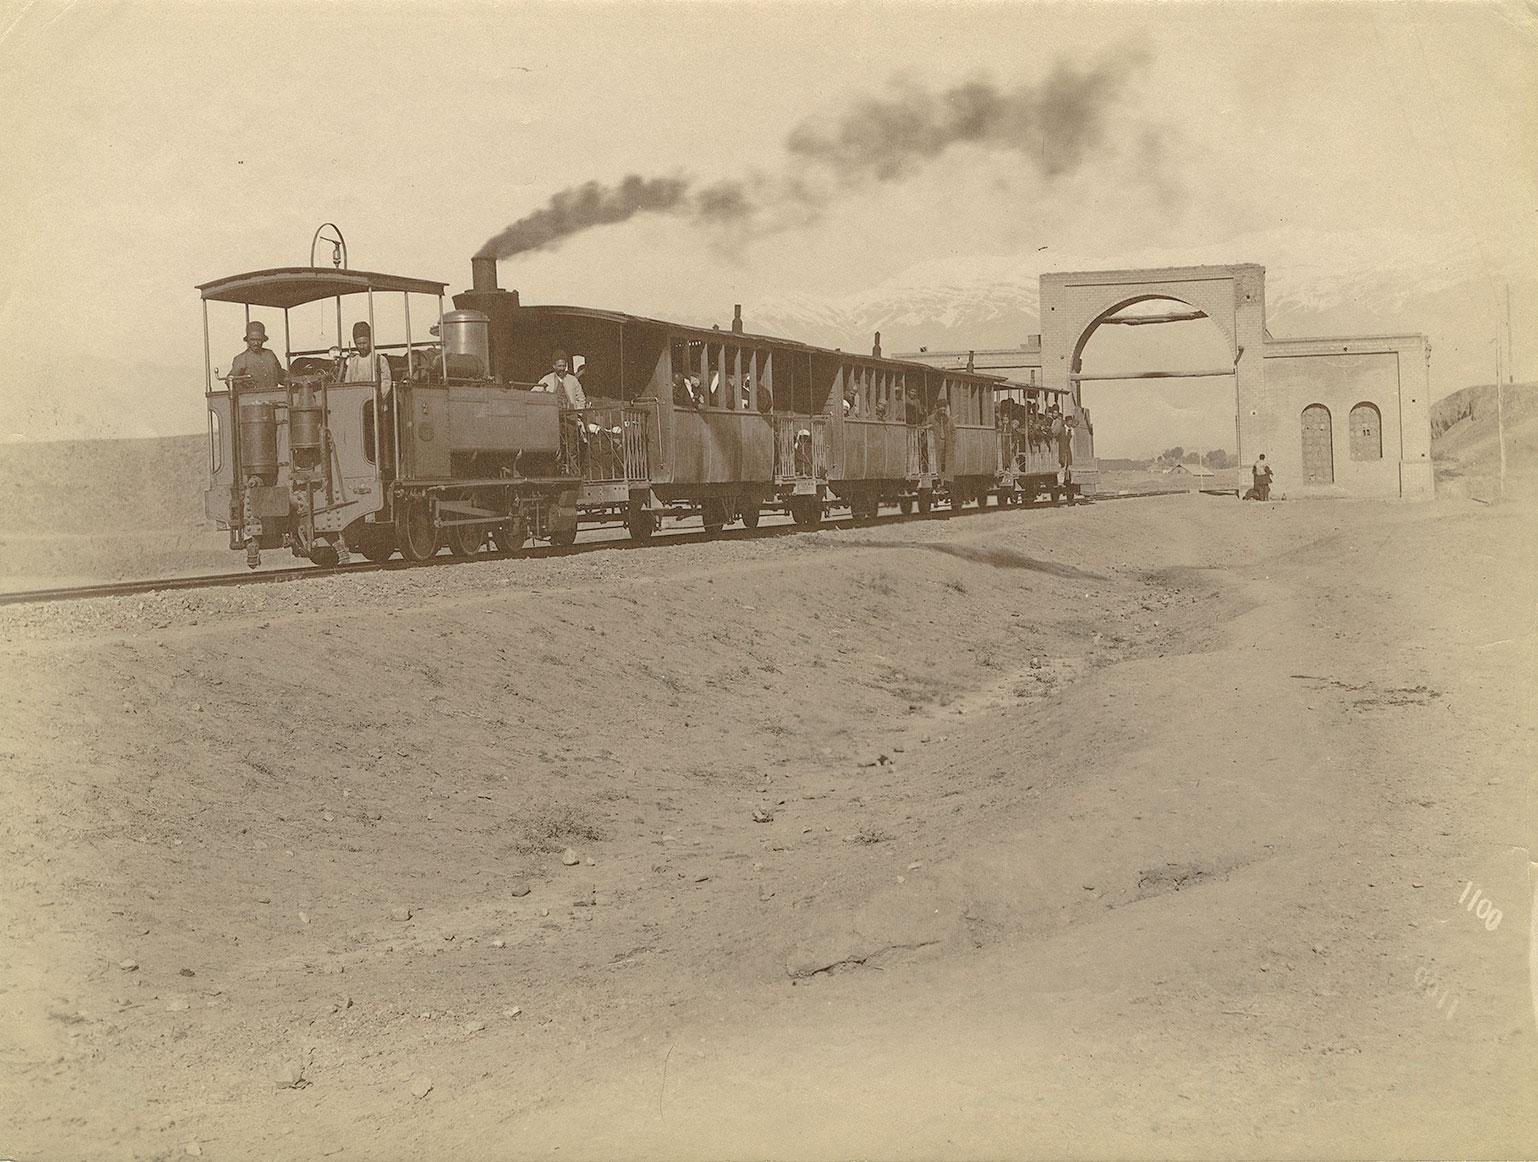 Railway to Shāh Abdol Azīm Shrine, taken by Antoin Sevruguin Albumen, late nineteenth century